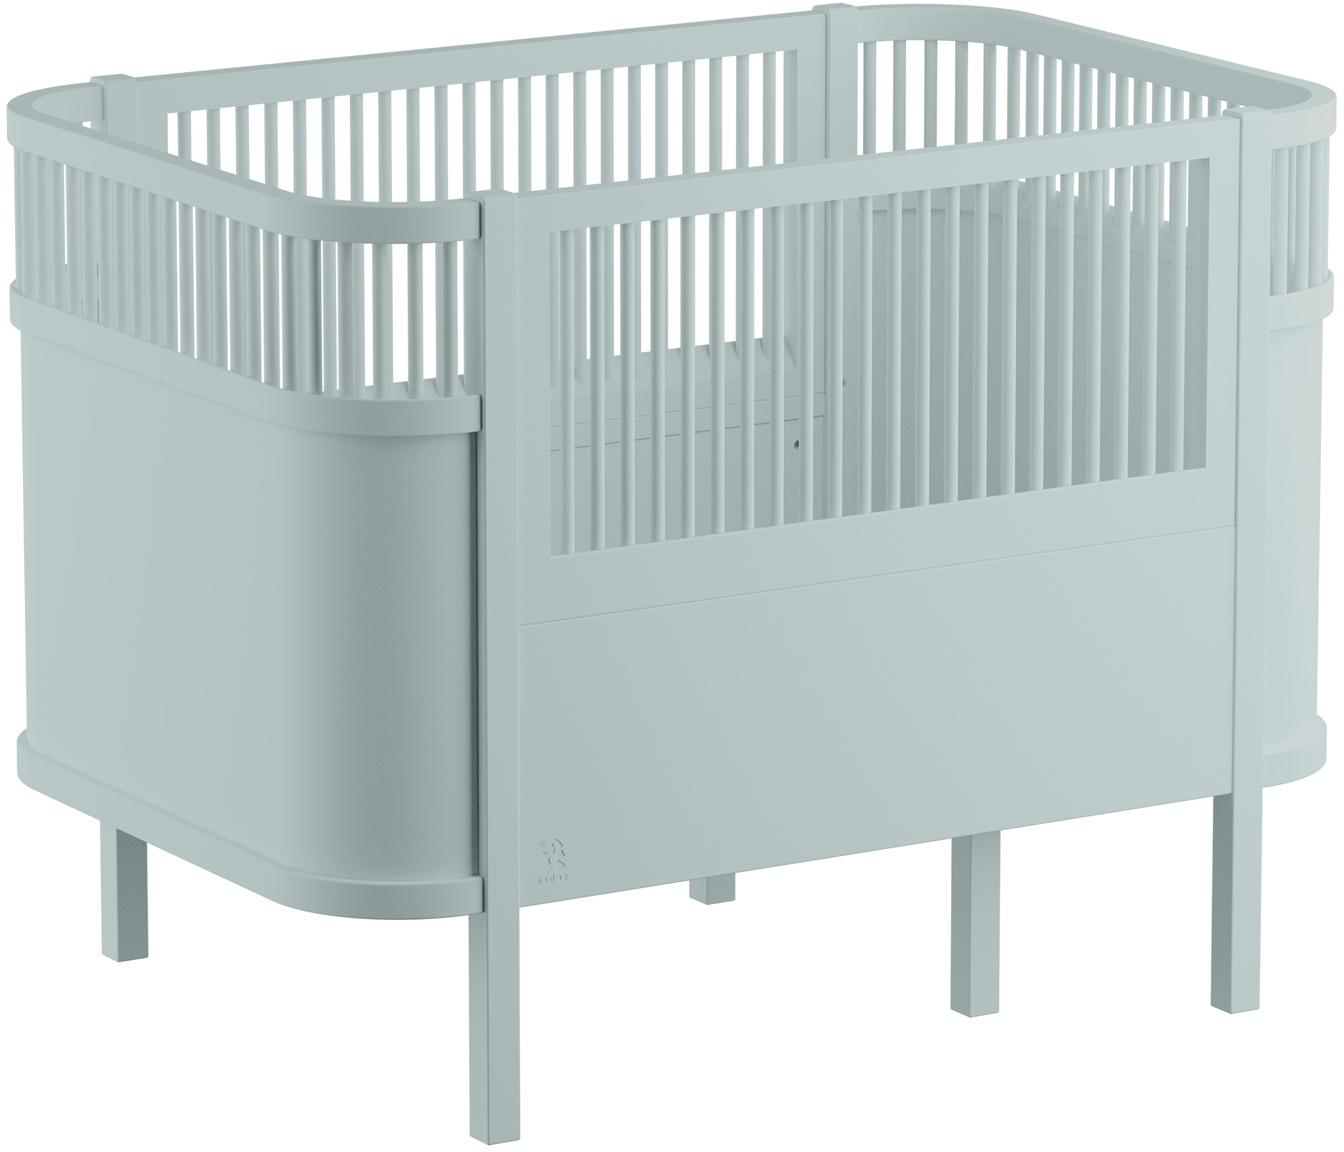 Baby-Bett Junior, Birkenholz, lackiert, Grün, 115 x 88 cm